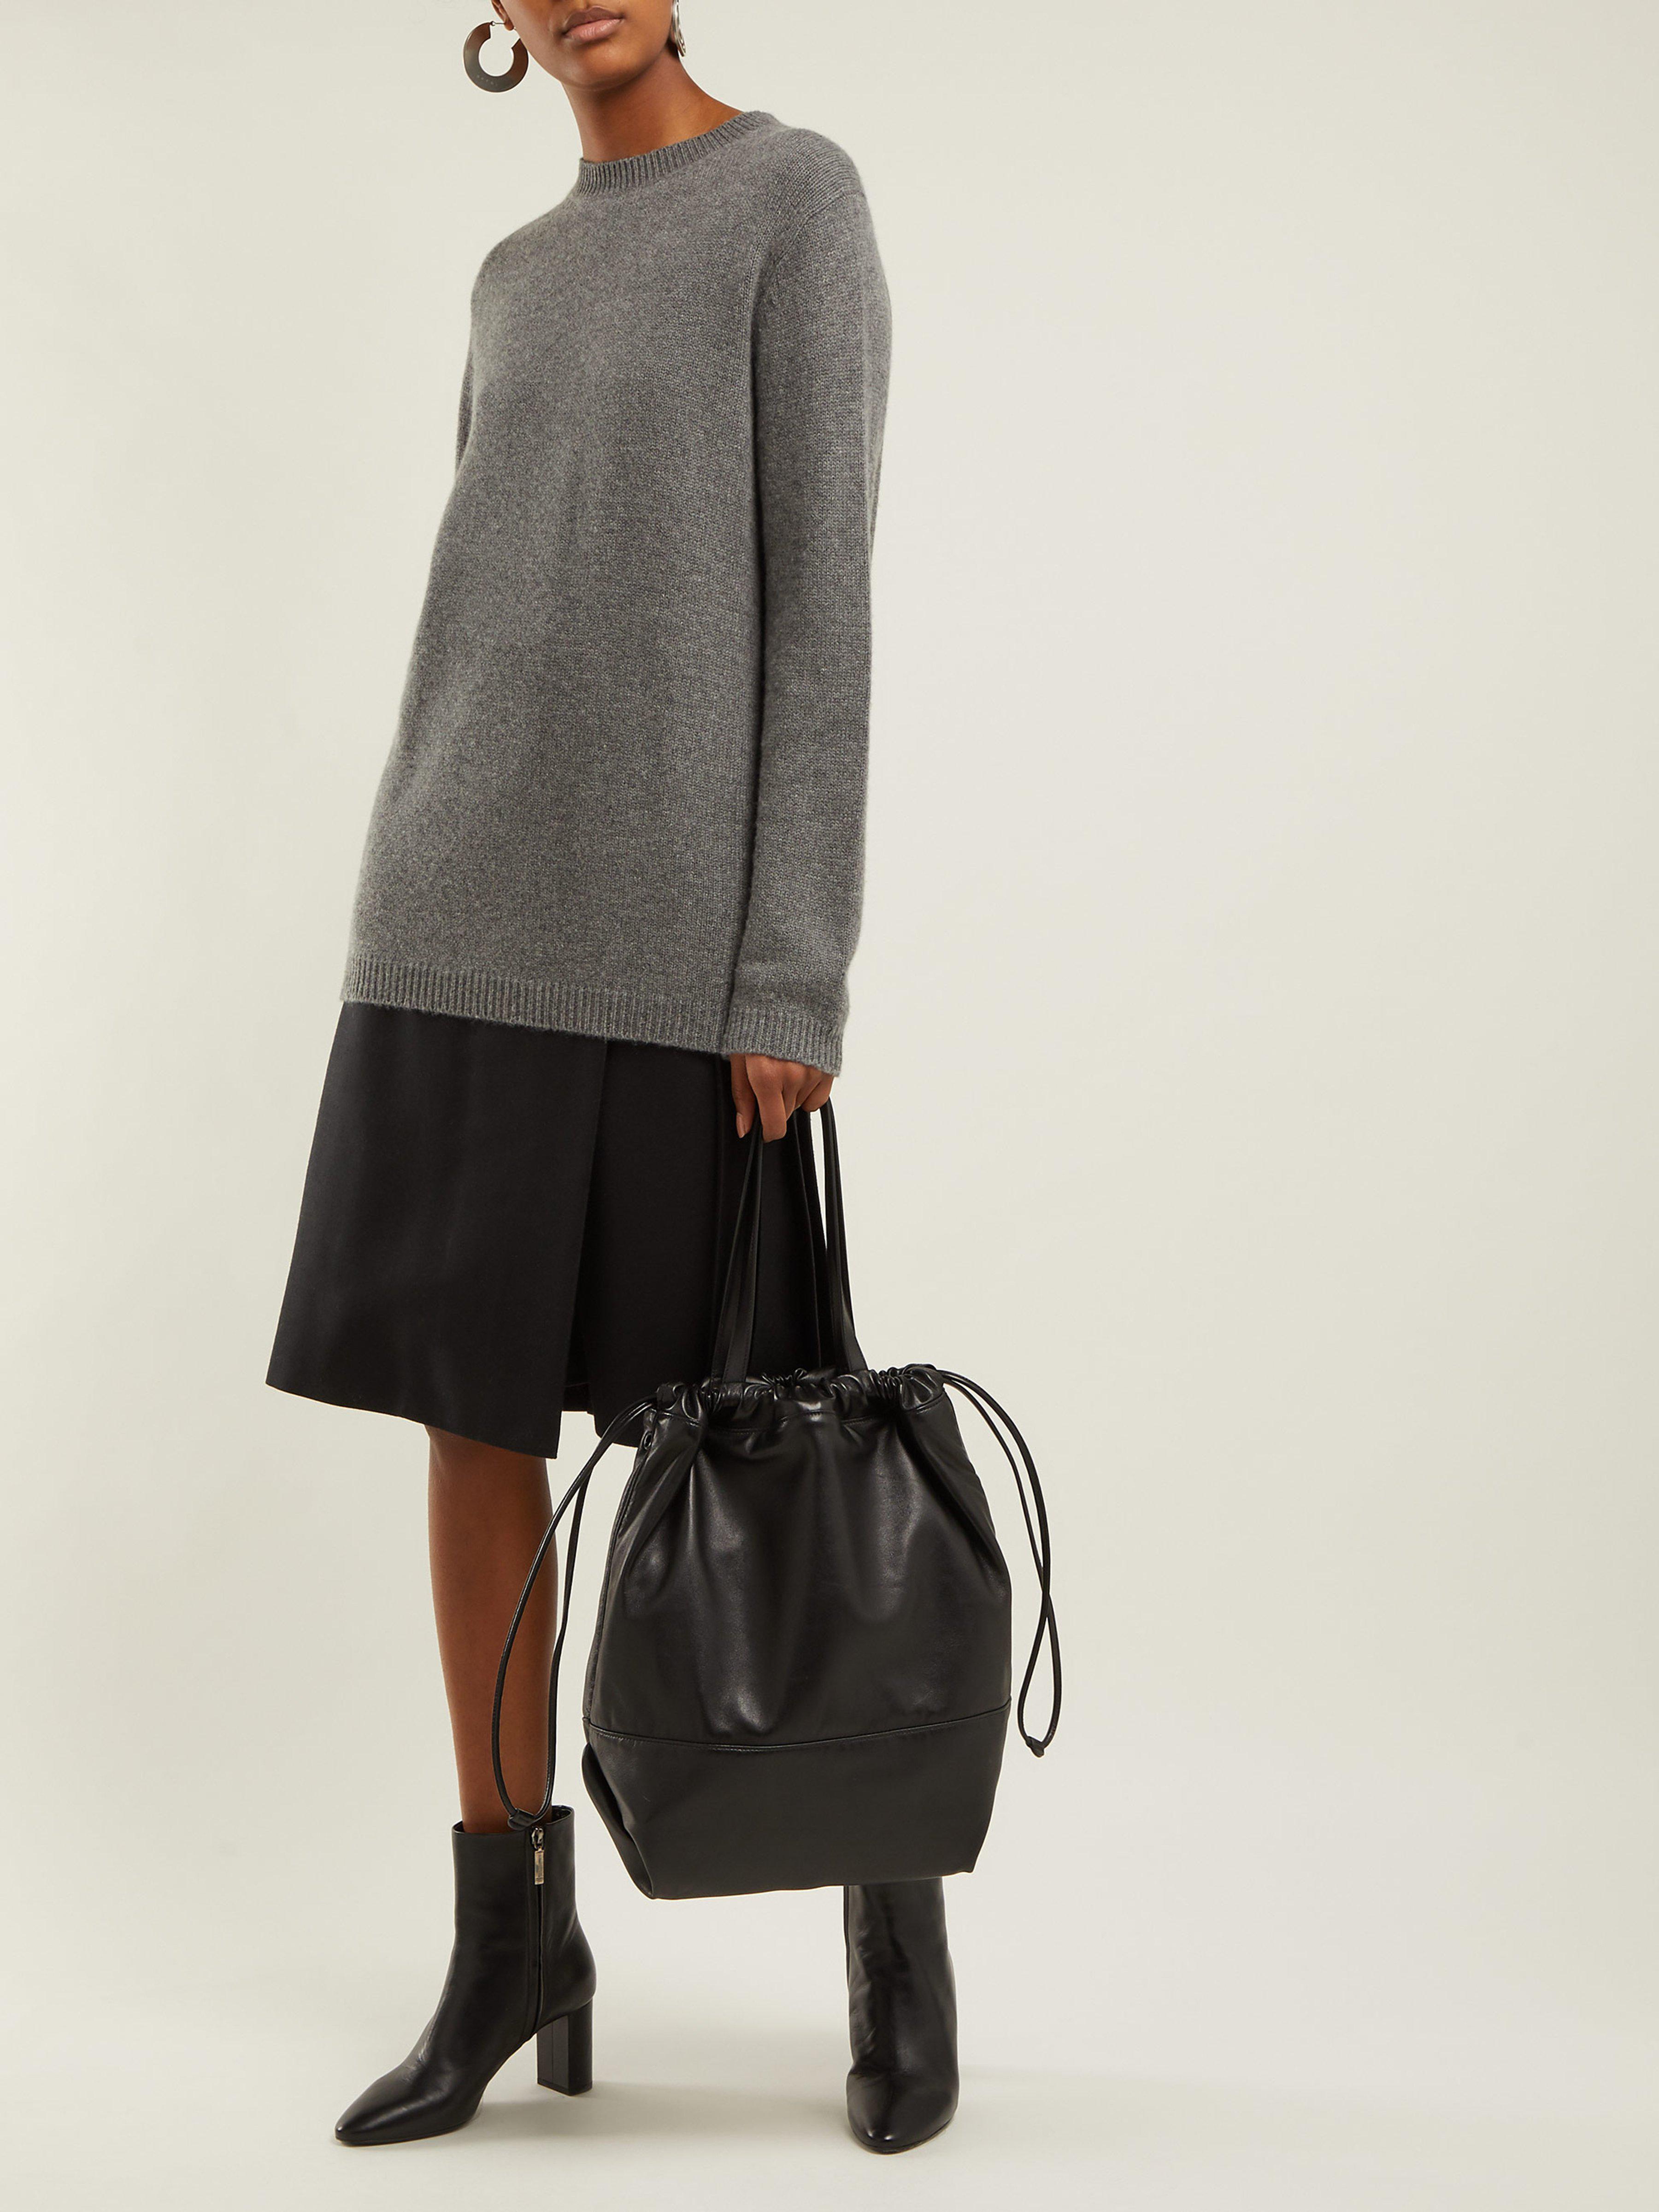 e37d7f9f2 Saint Laurent Harlem Drawstring Leather Tote Bag in Black - Lyst